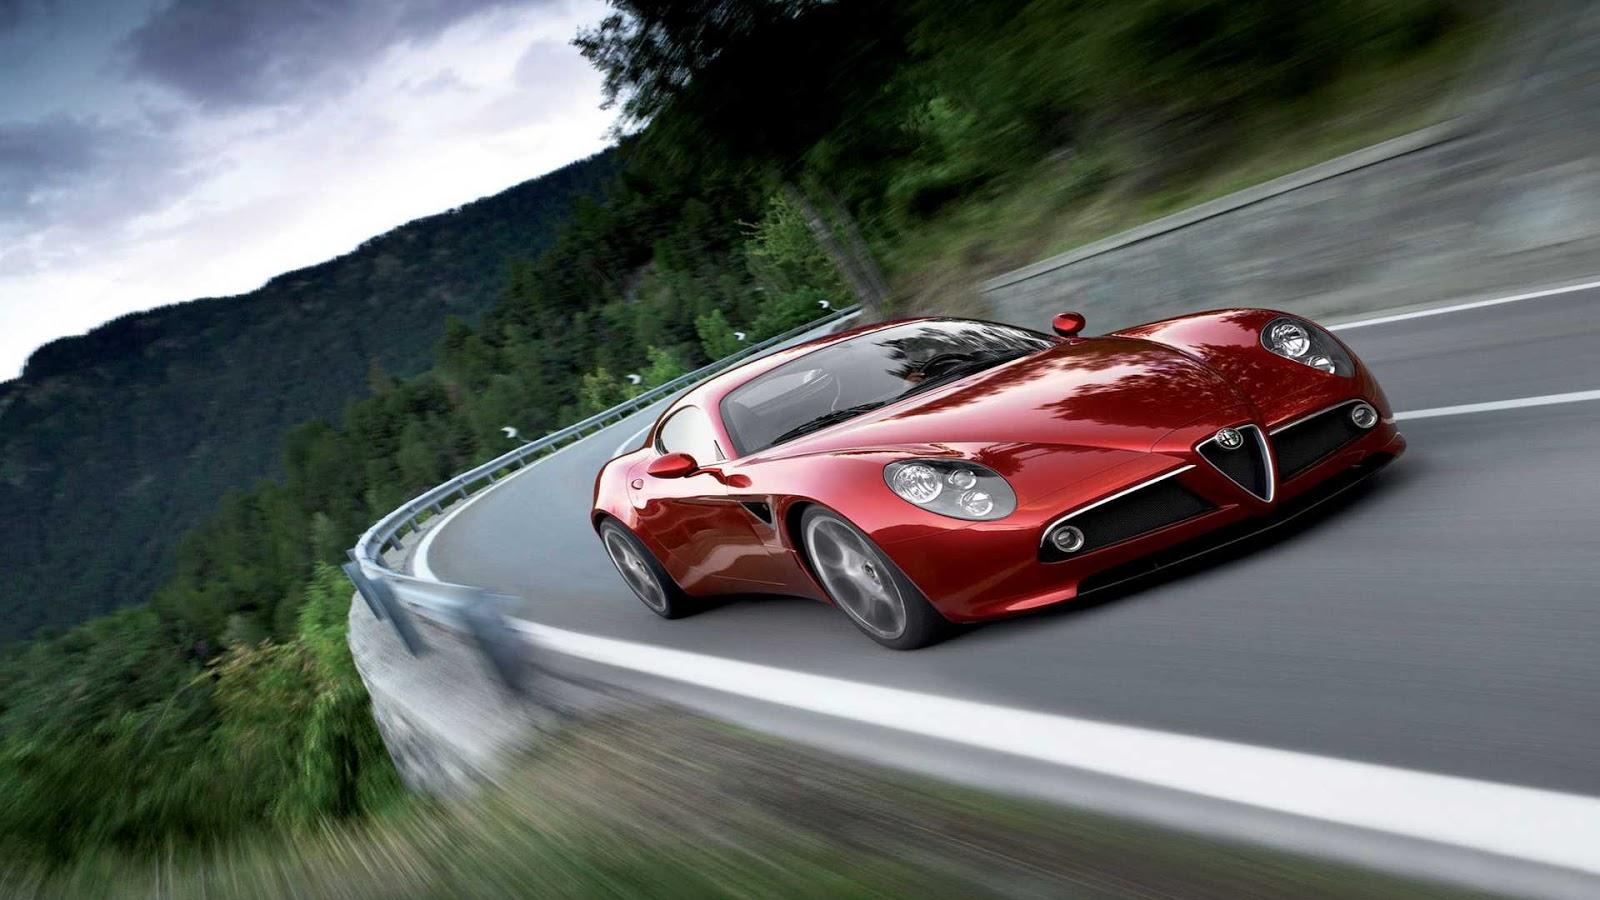 http://1.bp.blogspot.com/-YOLOriyzZ40/UNh6Jnc5nuI/AAAAAAAAvos/YA57XrhBrUc/s1600/1920x1080+Wallpaper+-+Auto+-+cars_0022.jpg